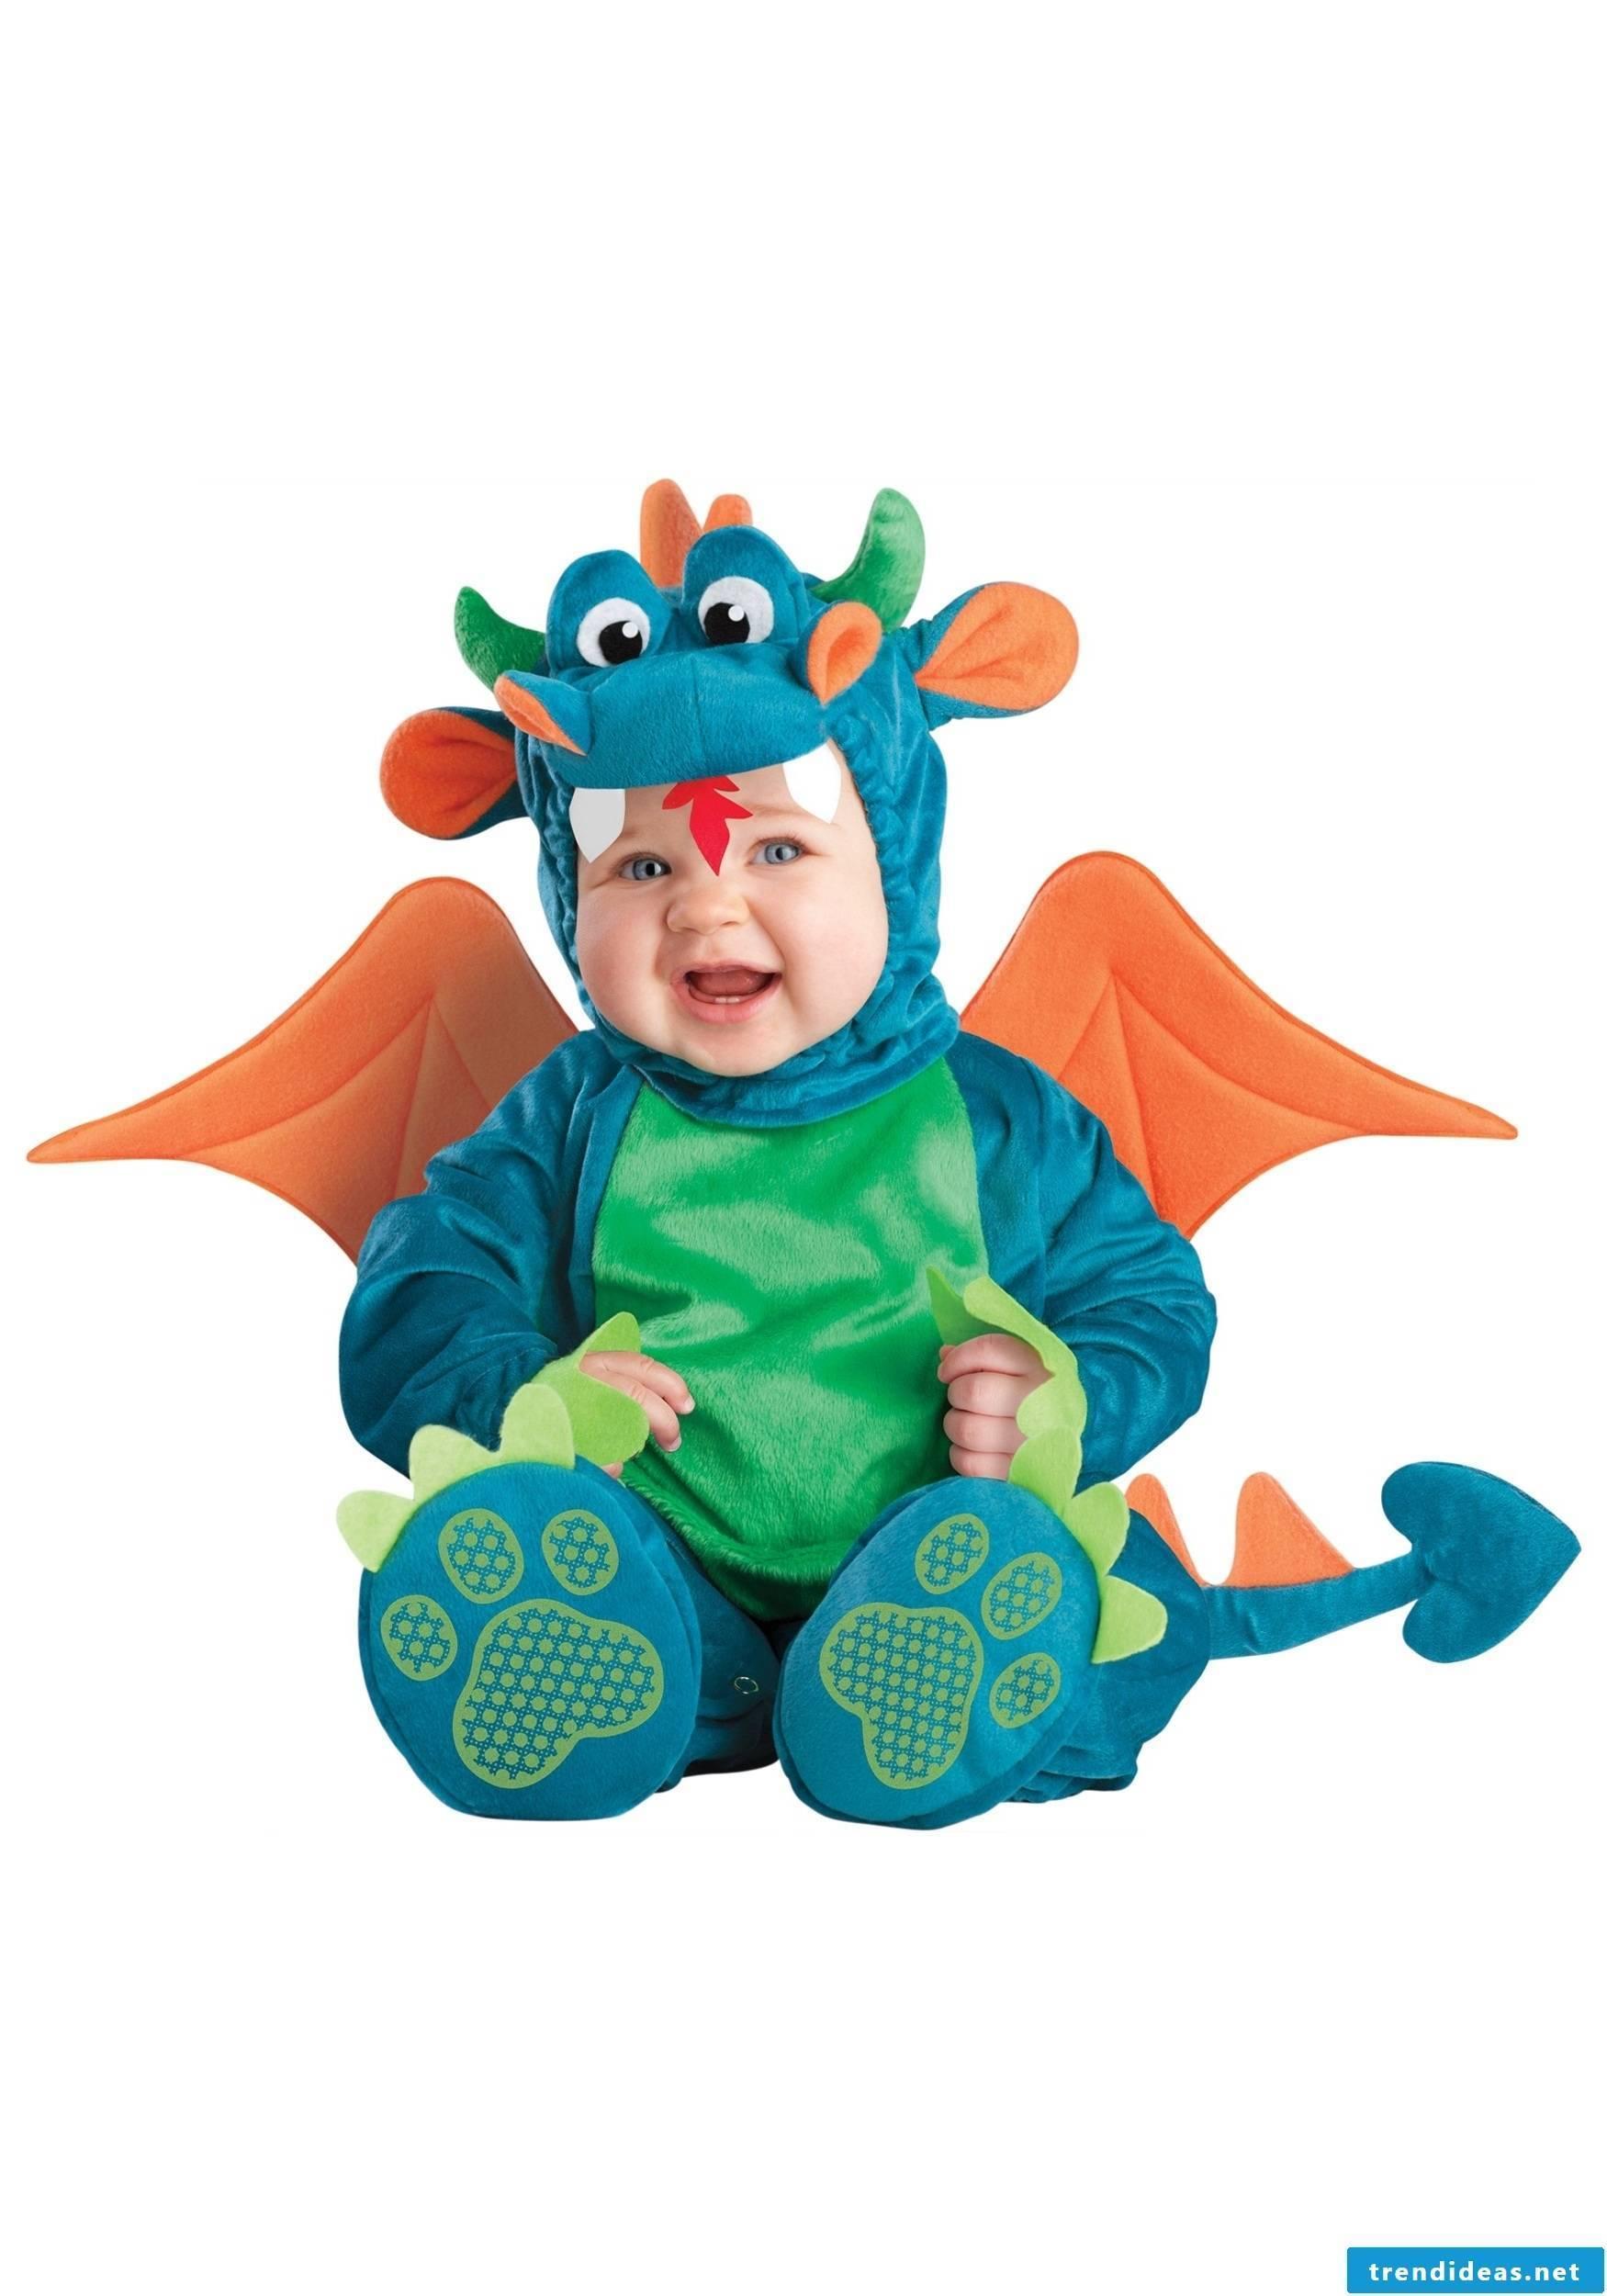 A cute baby dragon